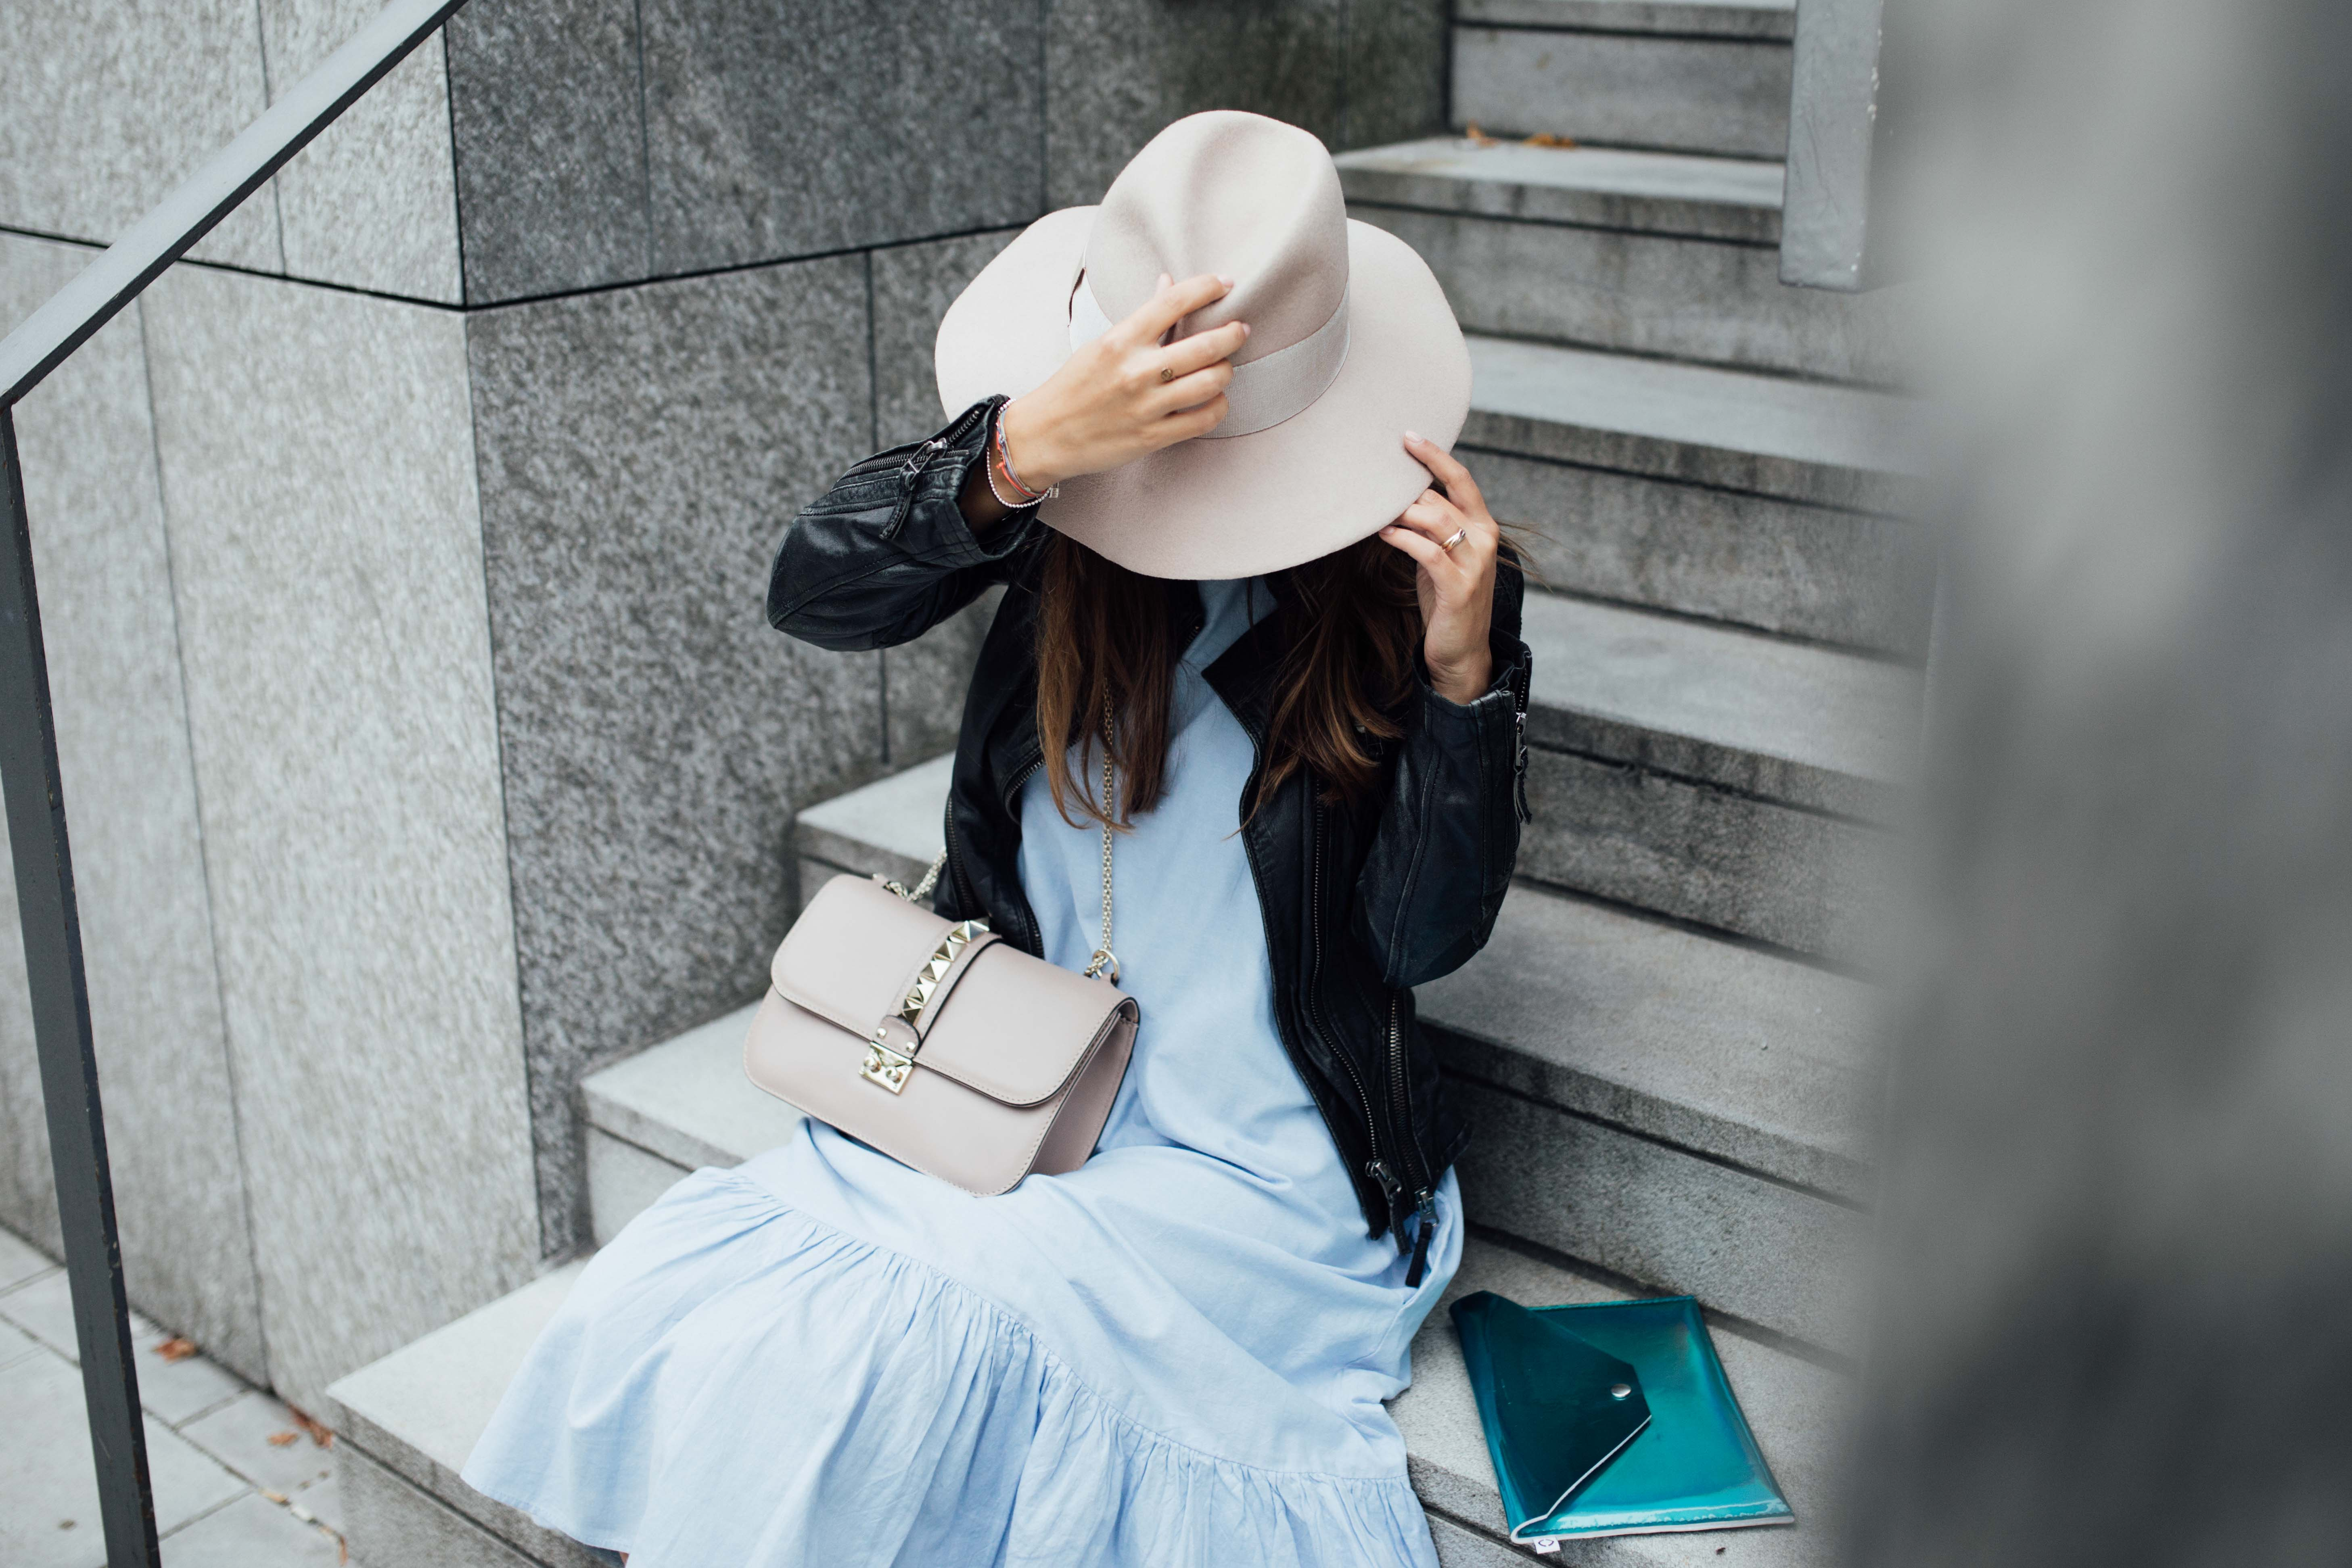 160919_yrml_blue_dress_web-43